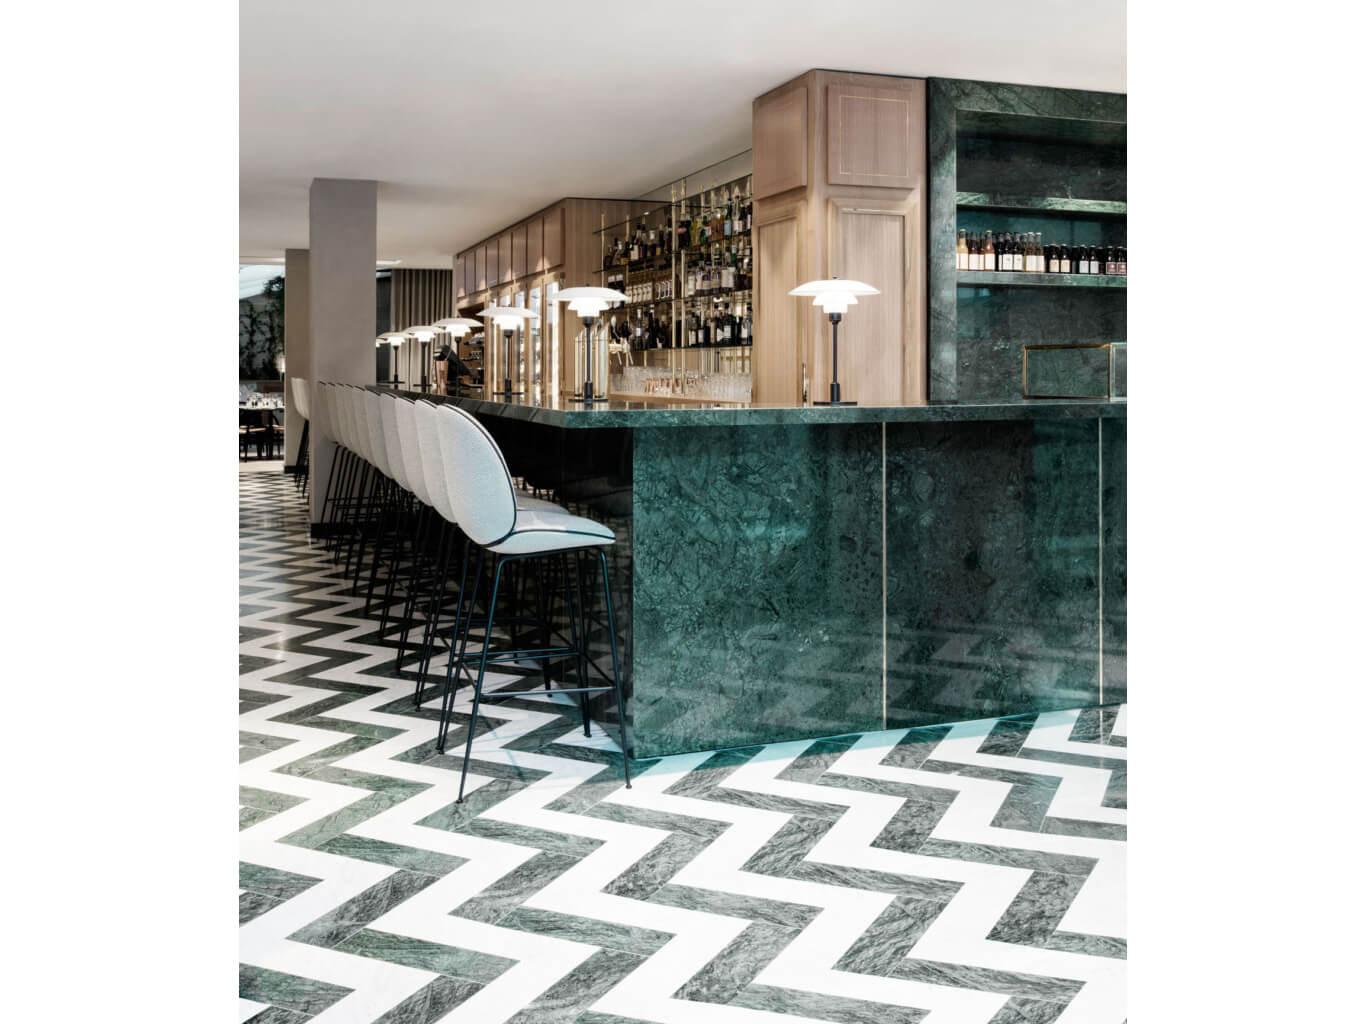 quay-bar-da-marble